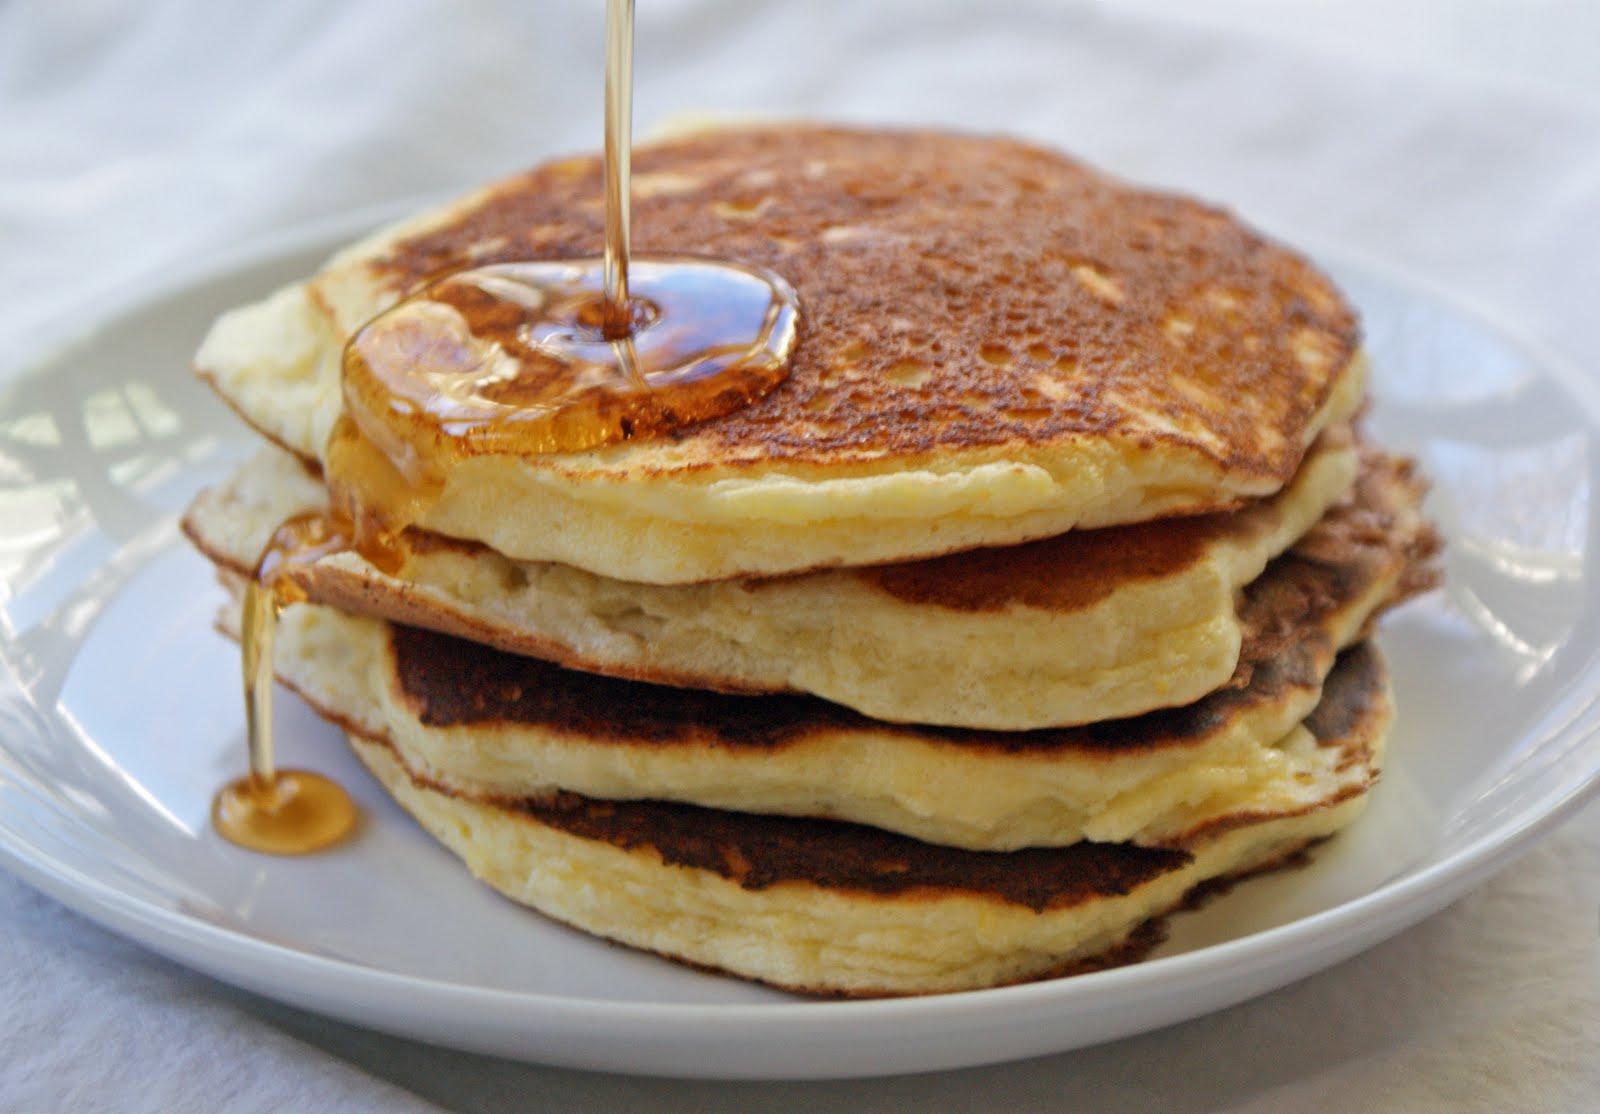 Lemon Ricotta Pancakes with Lemon Maple Syrup - Dinner With Julie